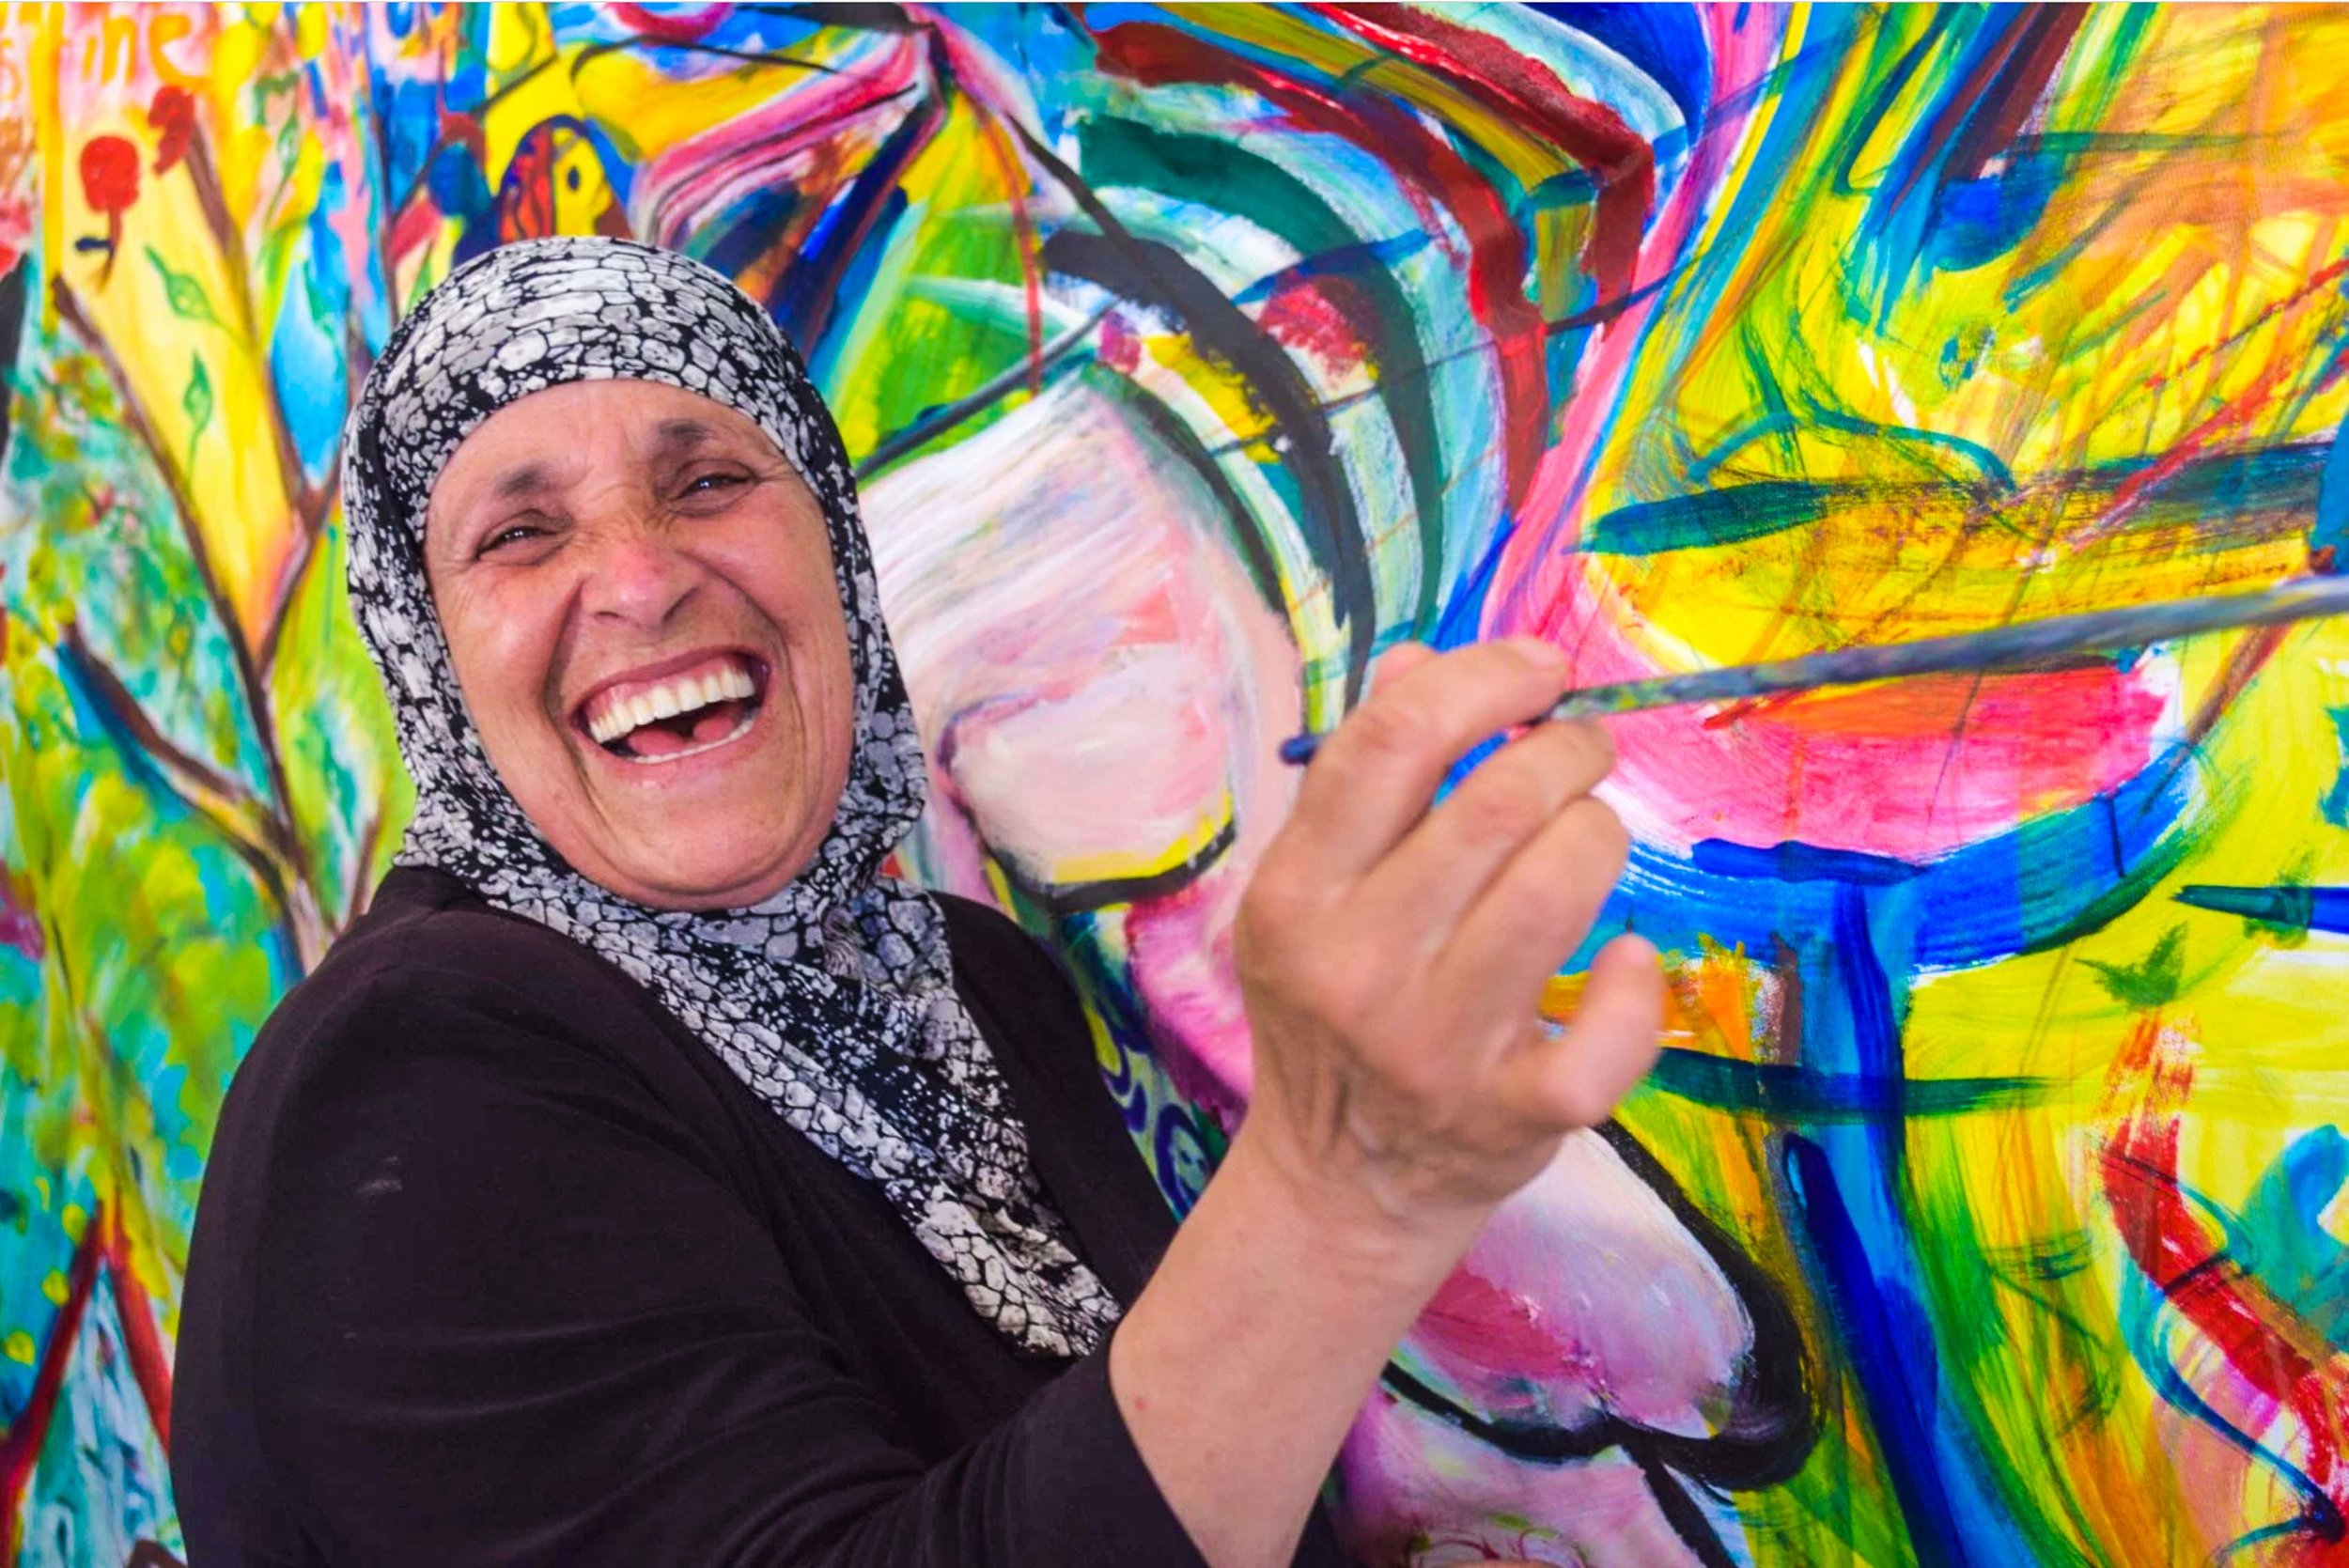 Palestininan woman with paintbrush low res.jpg